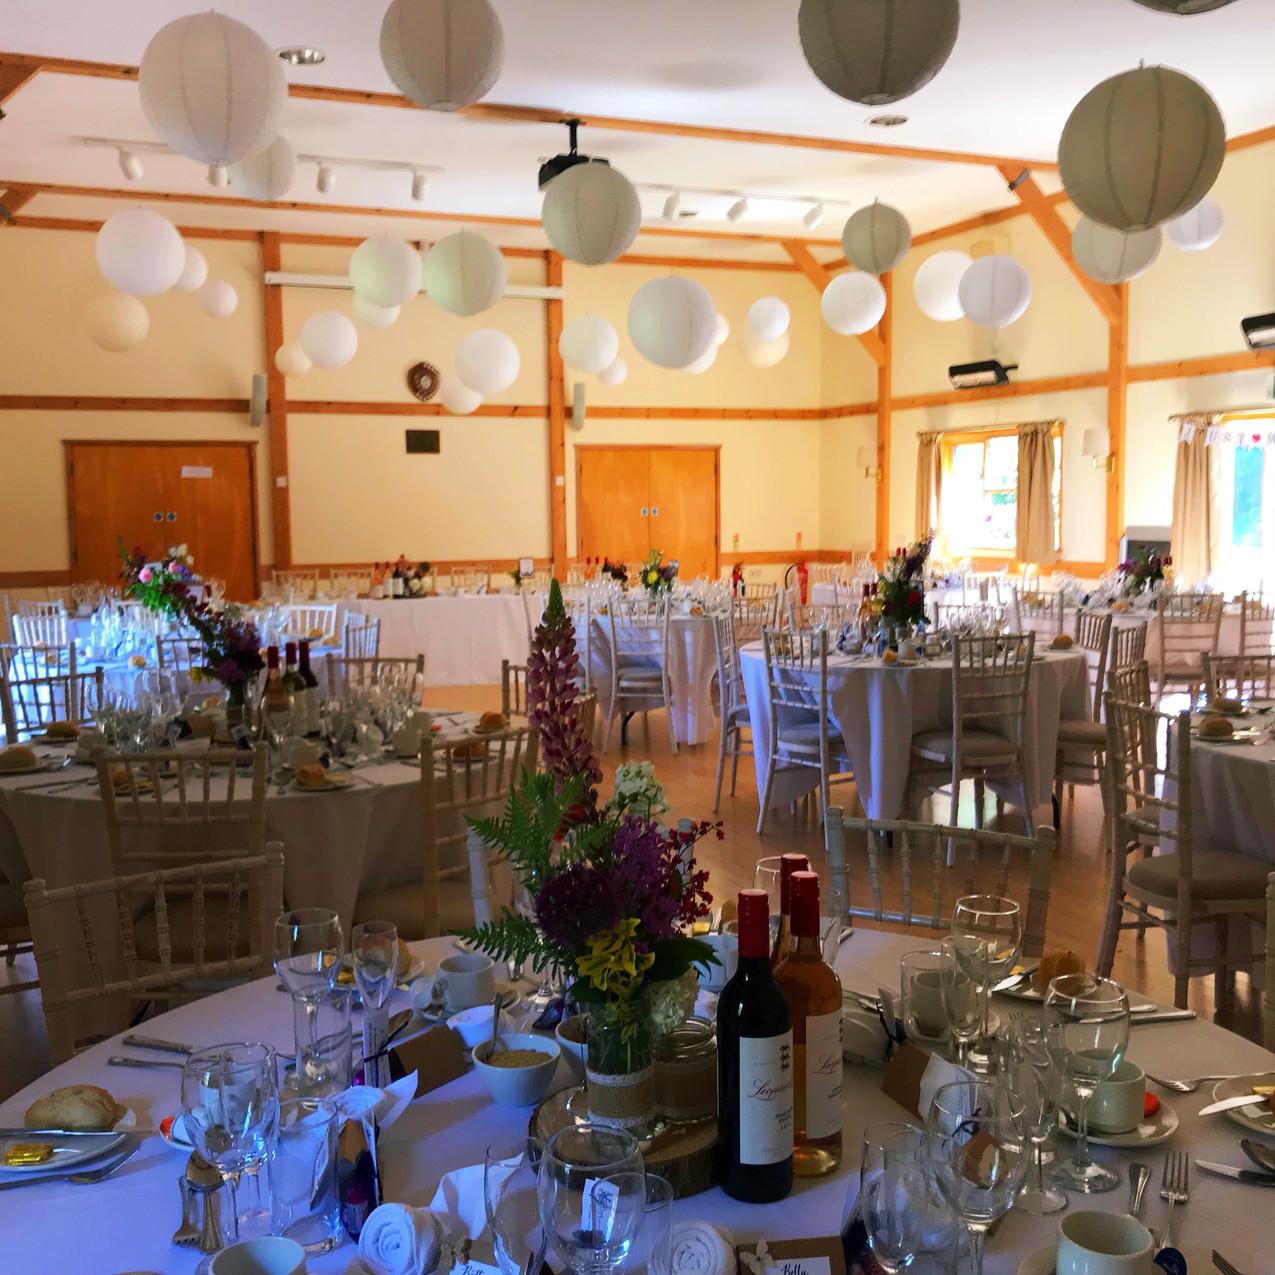 Chin Chin Caravan Bar at Andrew & Helen's Wedding at Lower Hardres Village Hall in Canterbury2